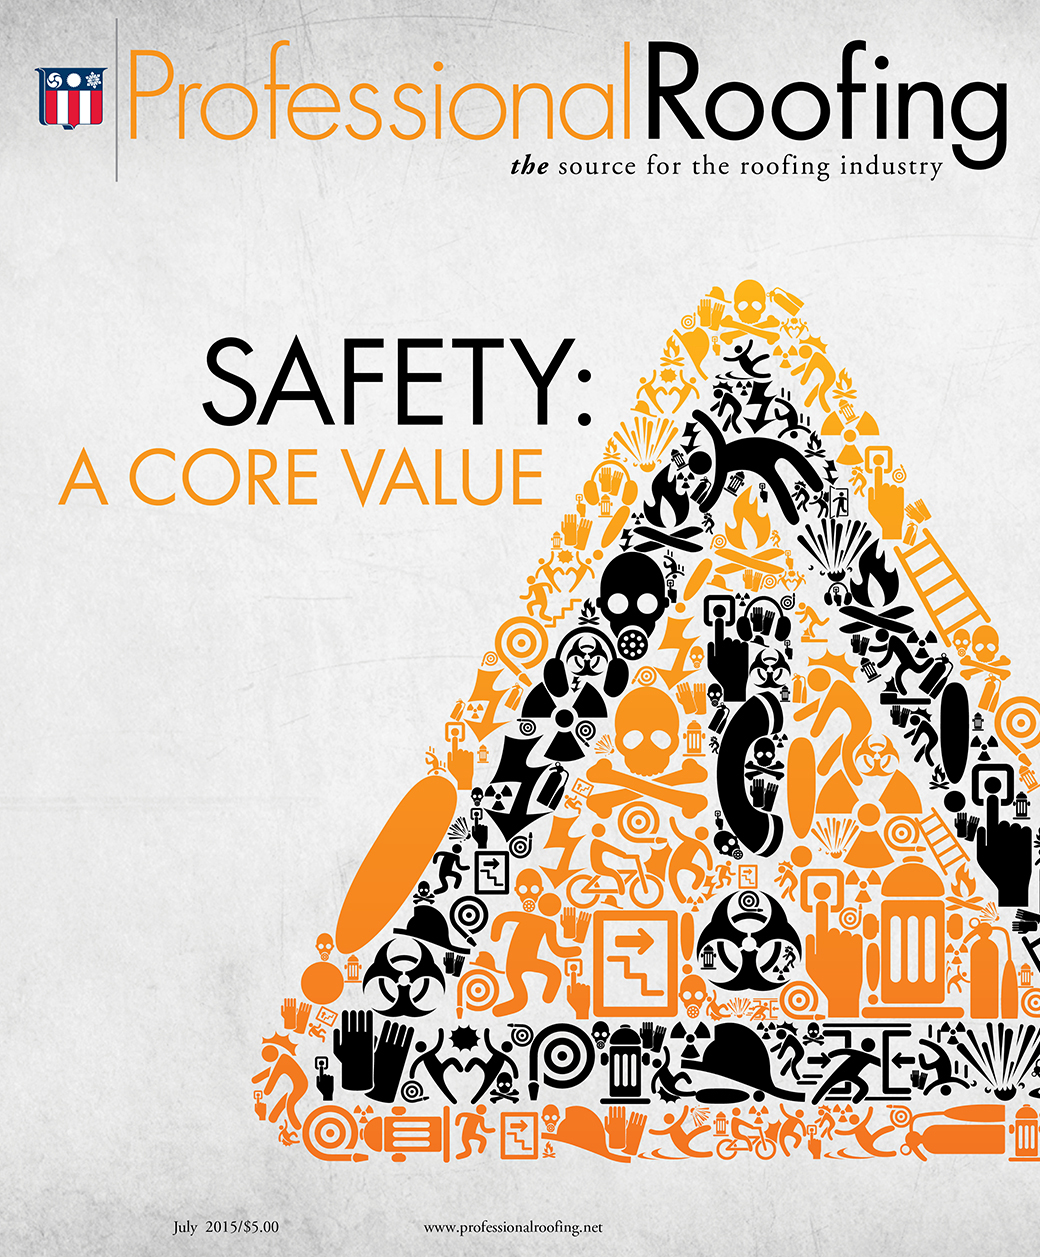 Professional Roofing Magazine 7/1/2015